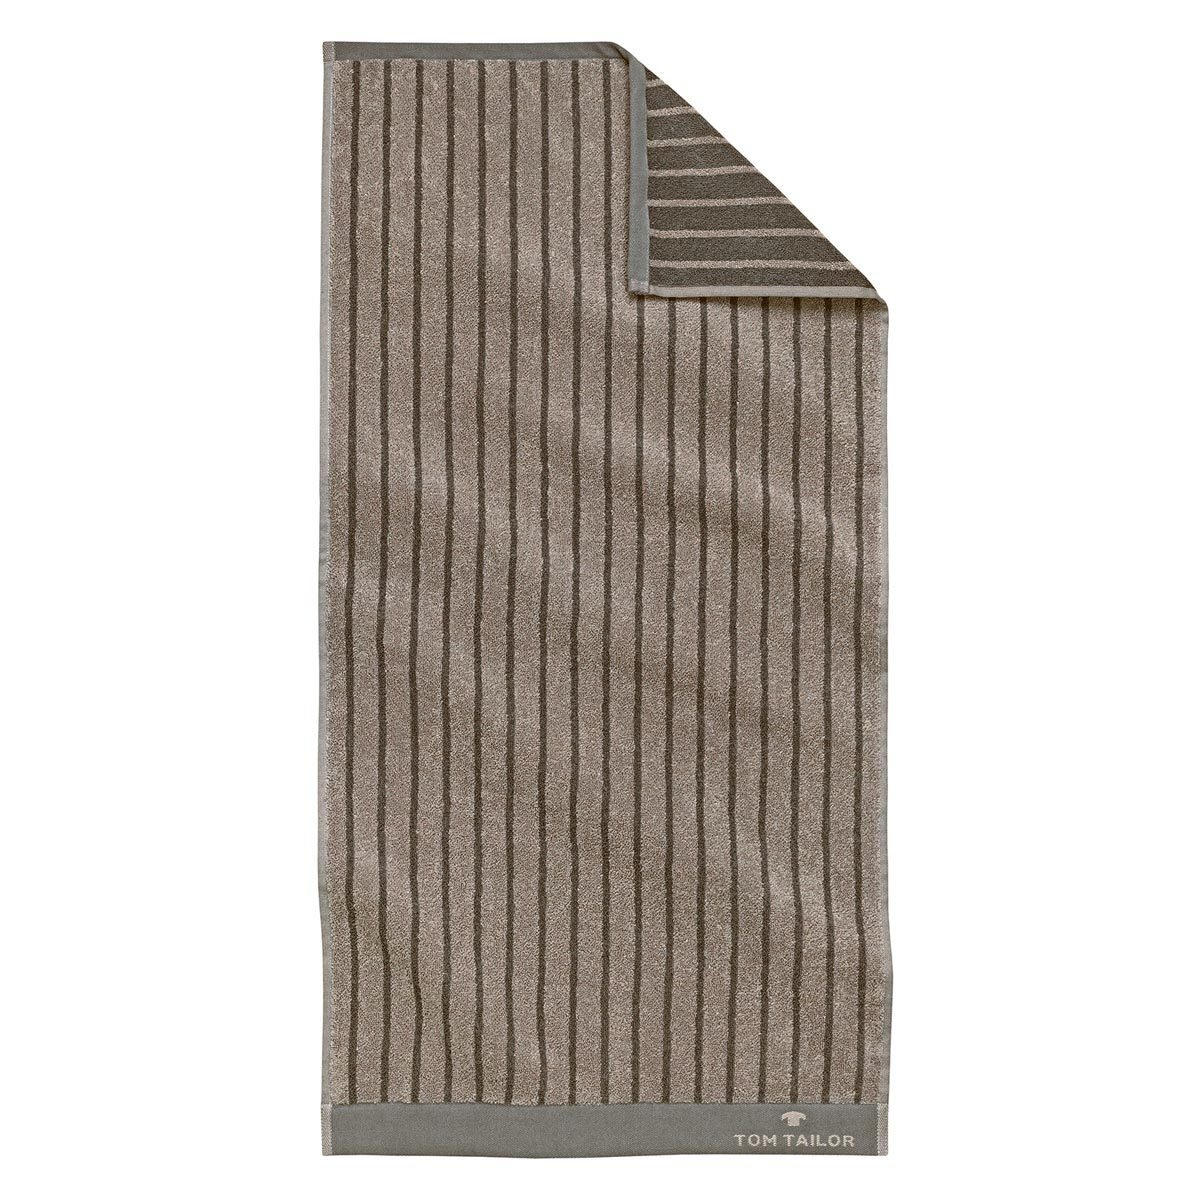 Tom Tailor Jacquard Handtücher Stripe